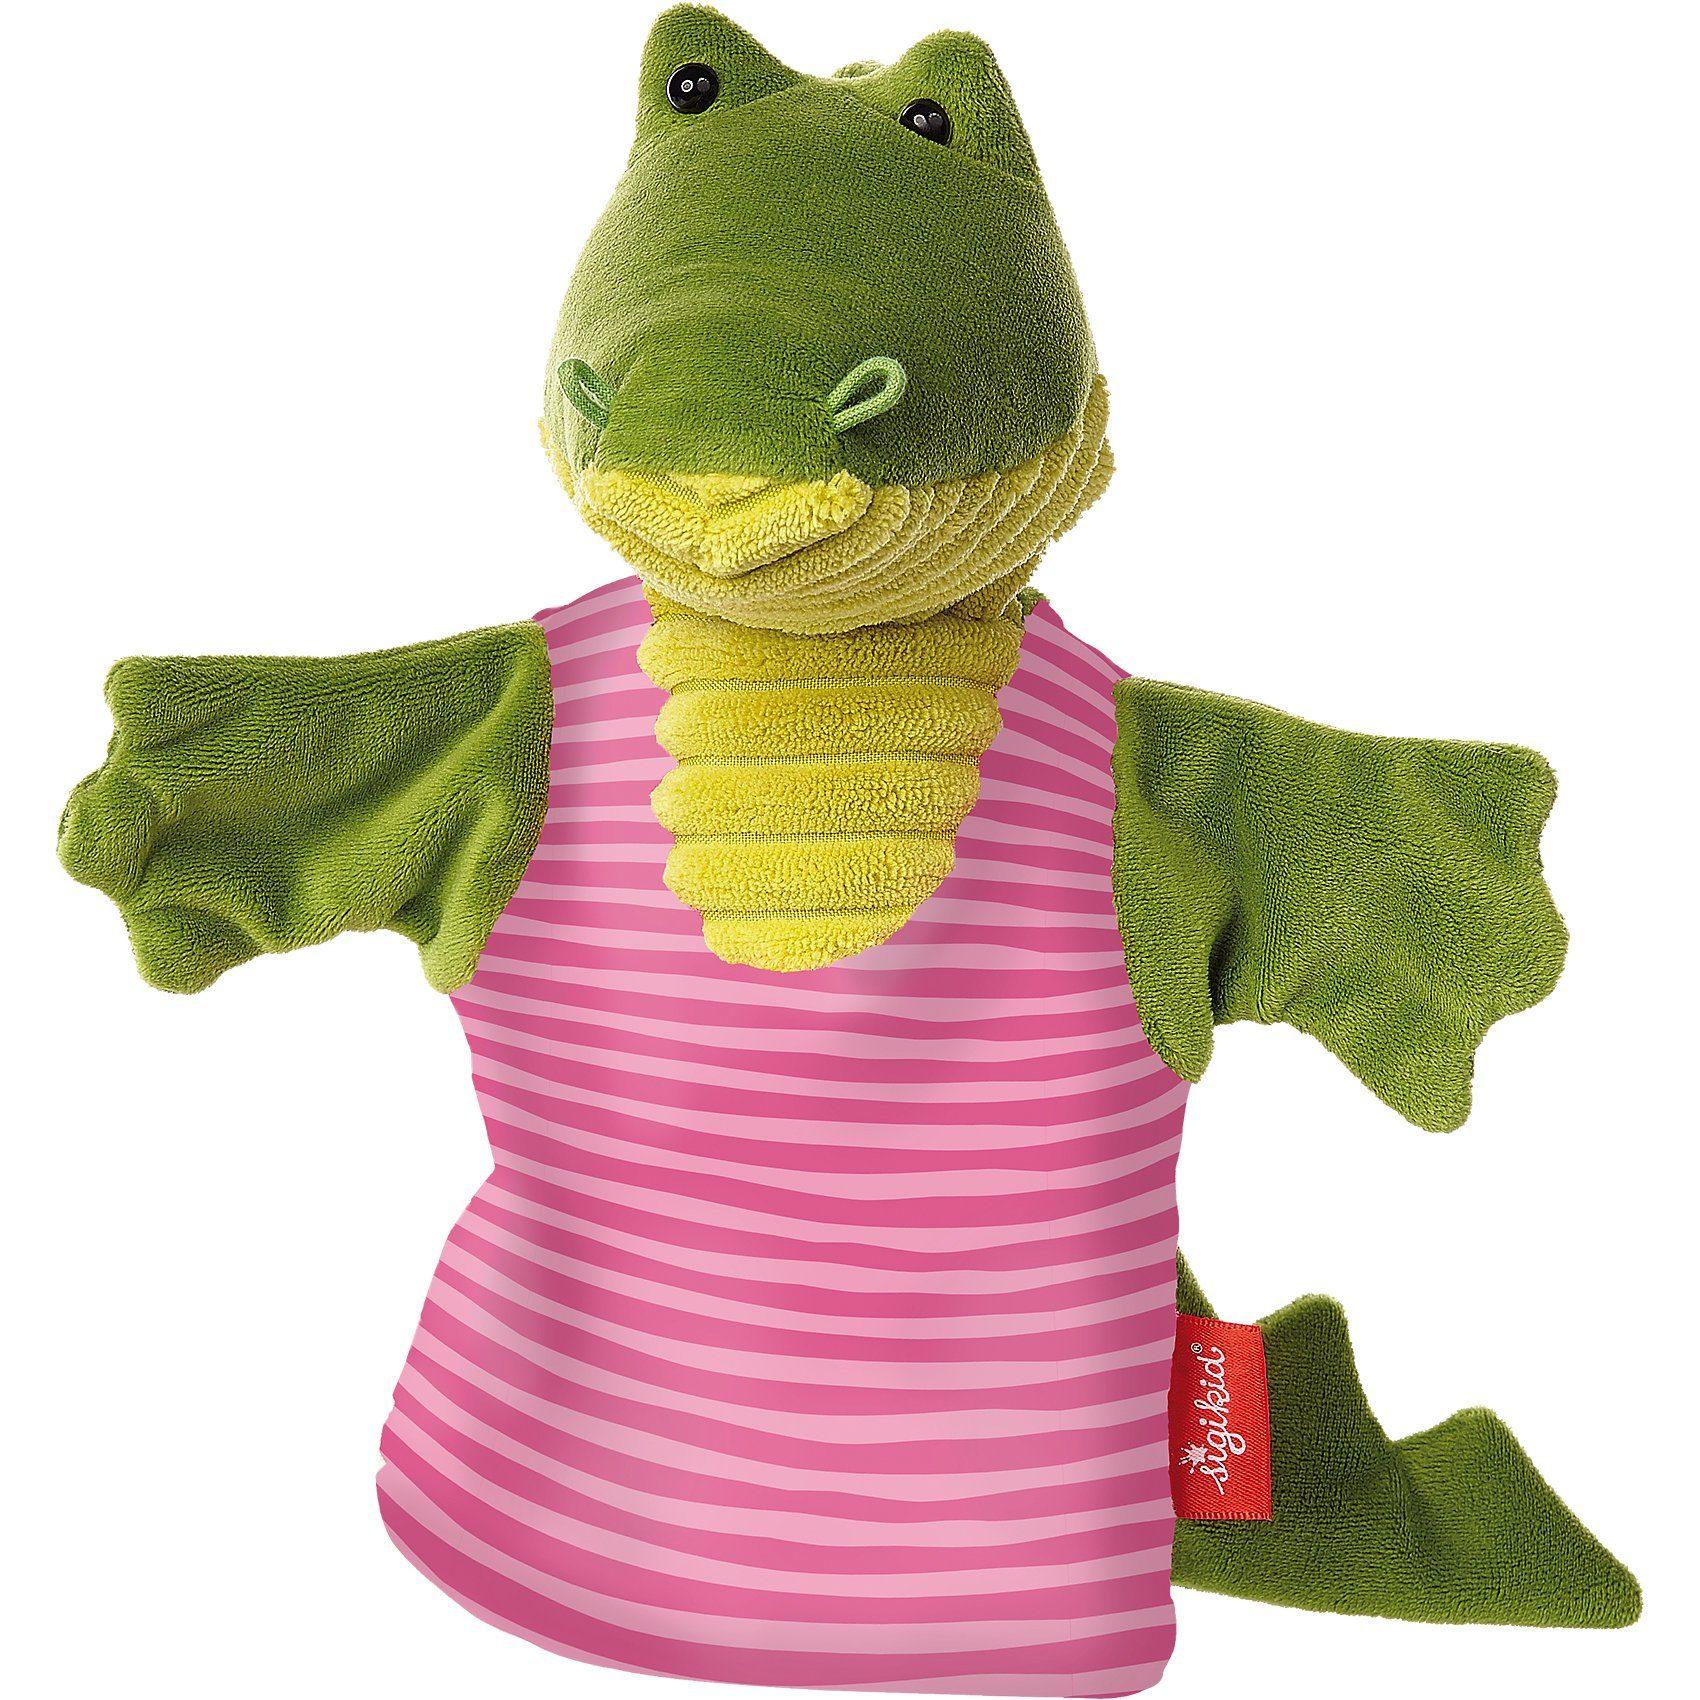 sigikid Handpuppe Krokodil, Sweety, 26cm (41330)